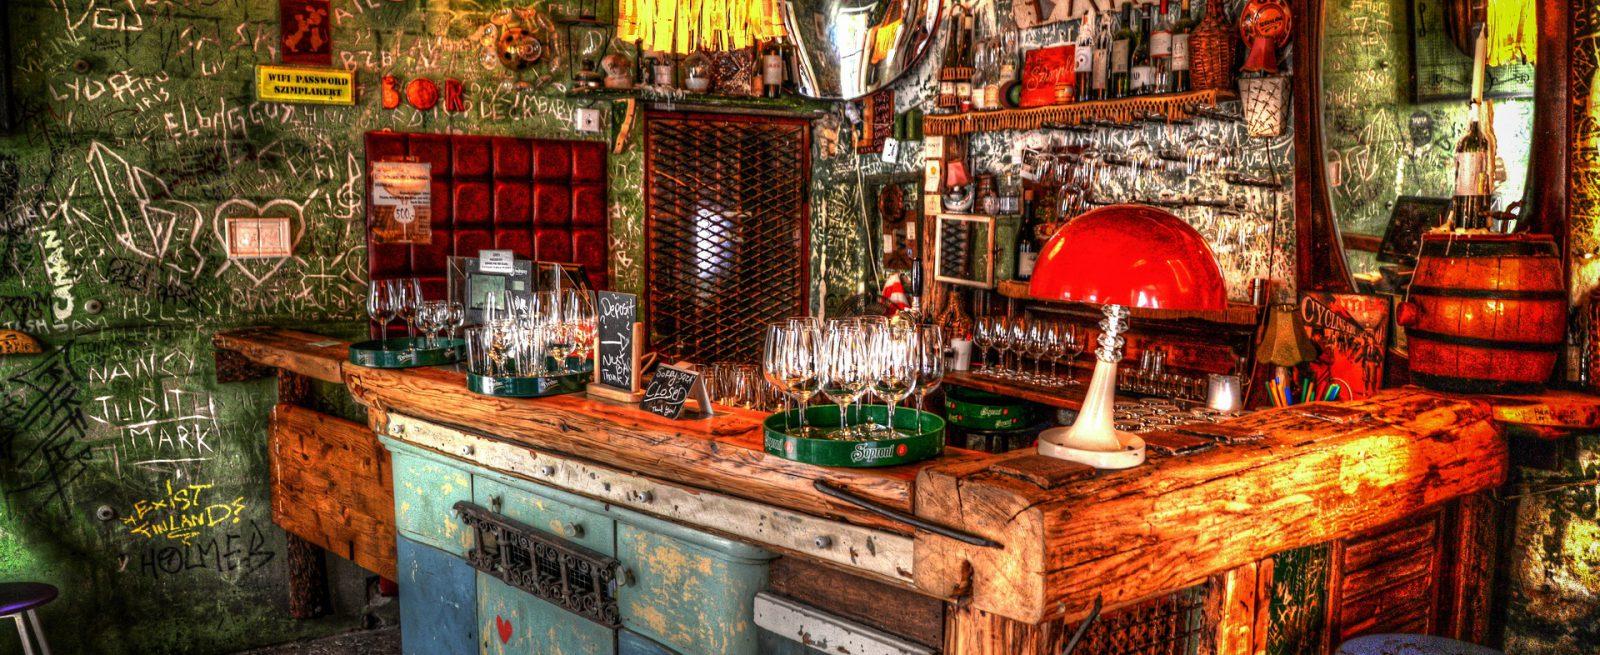 50 Buzzworthy Bar And Restaurant Promotion Ideas To Improve Slow Nights Modern Restaurant Management The Business Of Eating Restaurant Management News